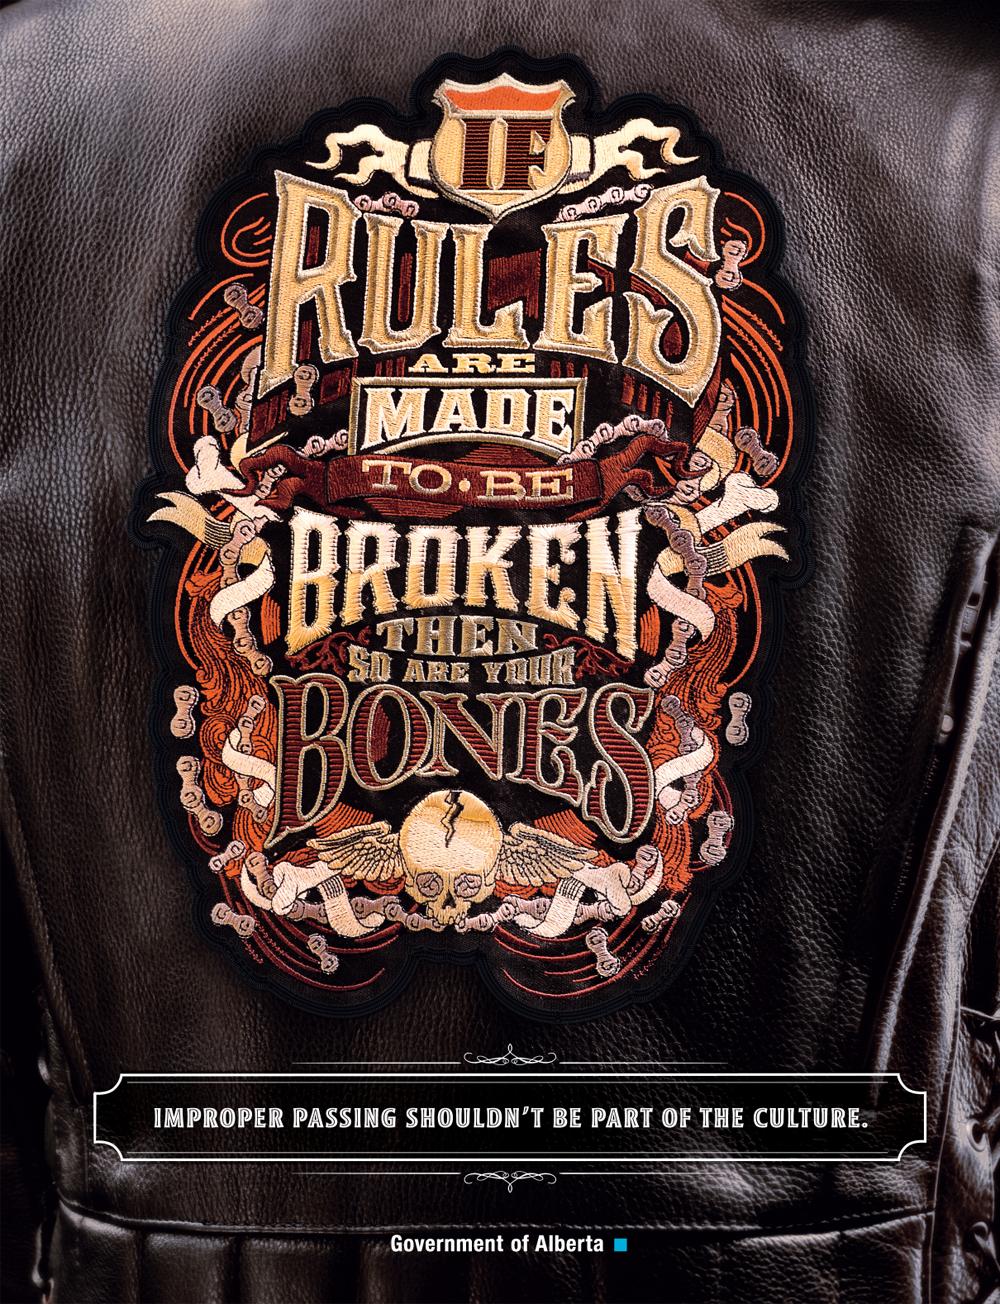 motorcycle safety alberta calder bateman nicola pringle LUCA IONESCU logo lettering Canada safety motorcycle campaign like minded studio